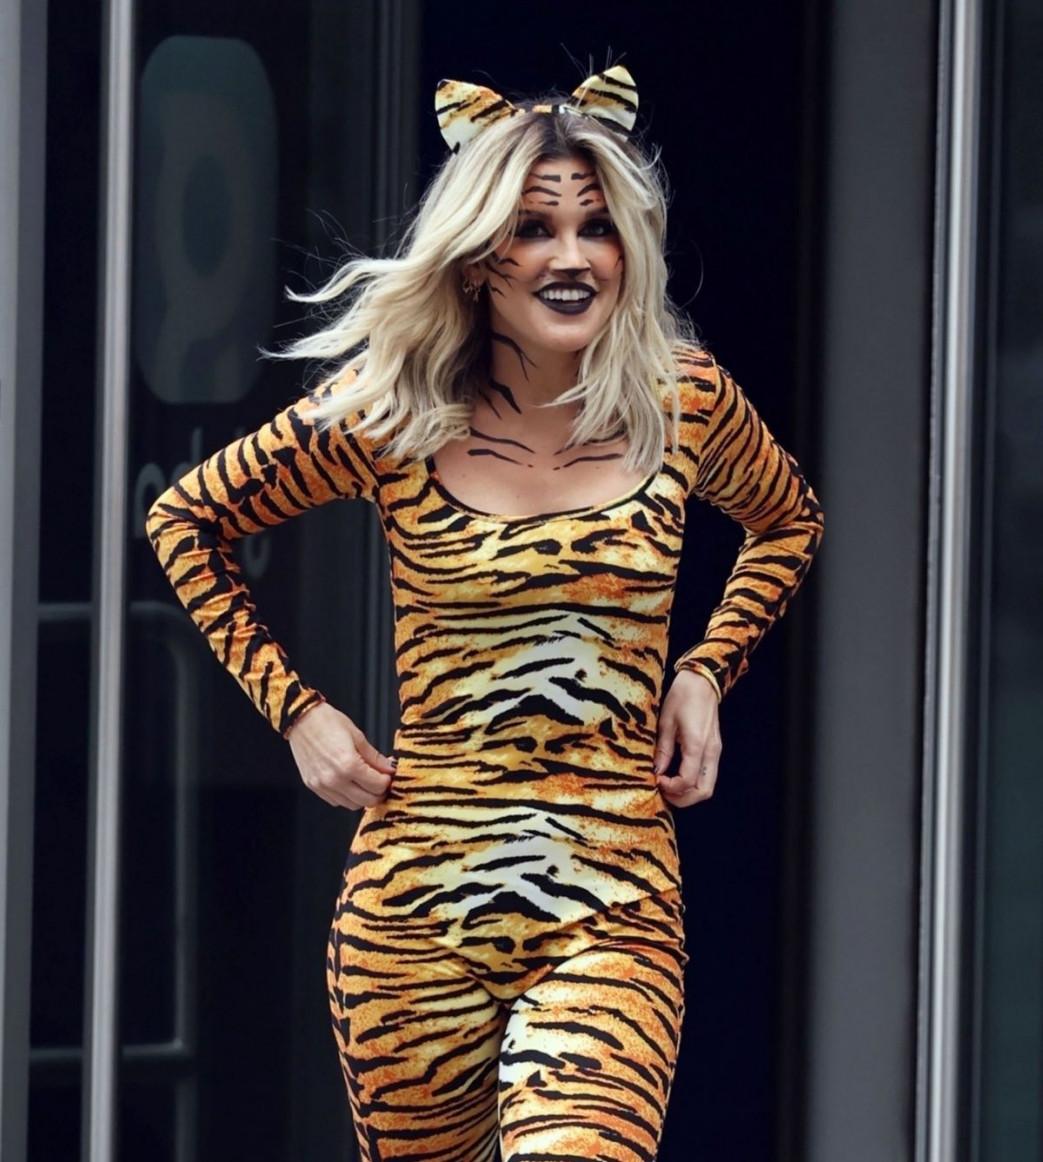 Ashley-Roberts-Stunning-in-Tiger-Catsuit-5.jpg